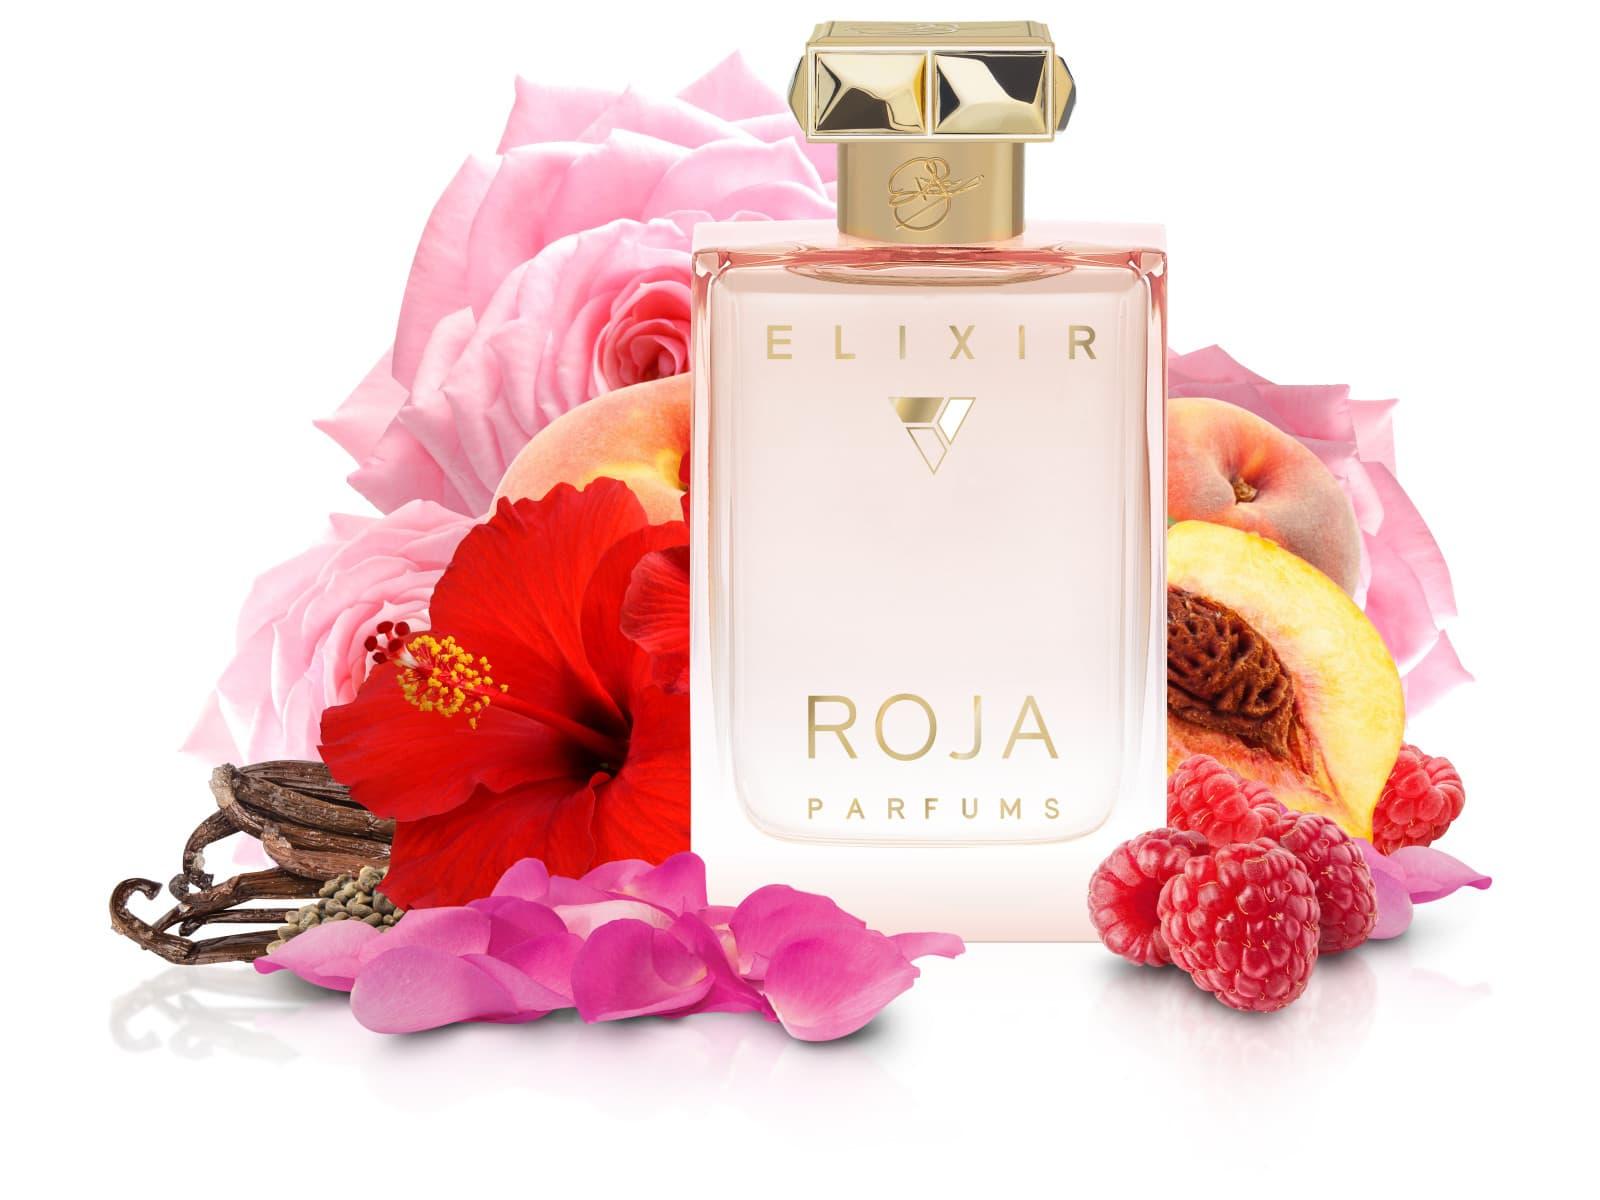 Elixir Pour Femme Essence De Parfum Roja Dove аромат новый аромат